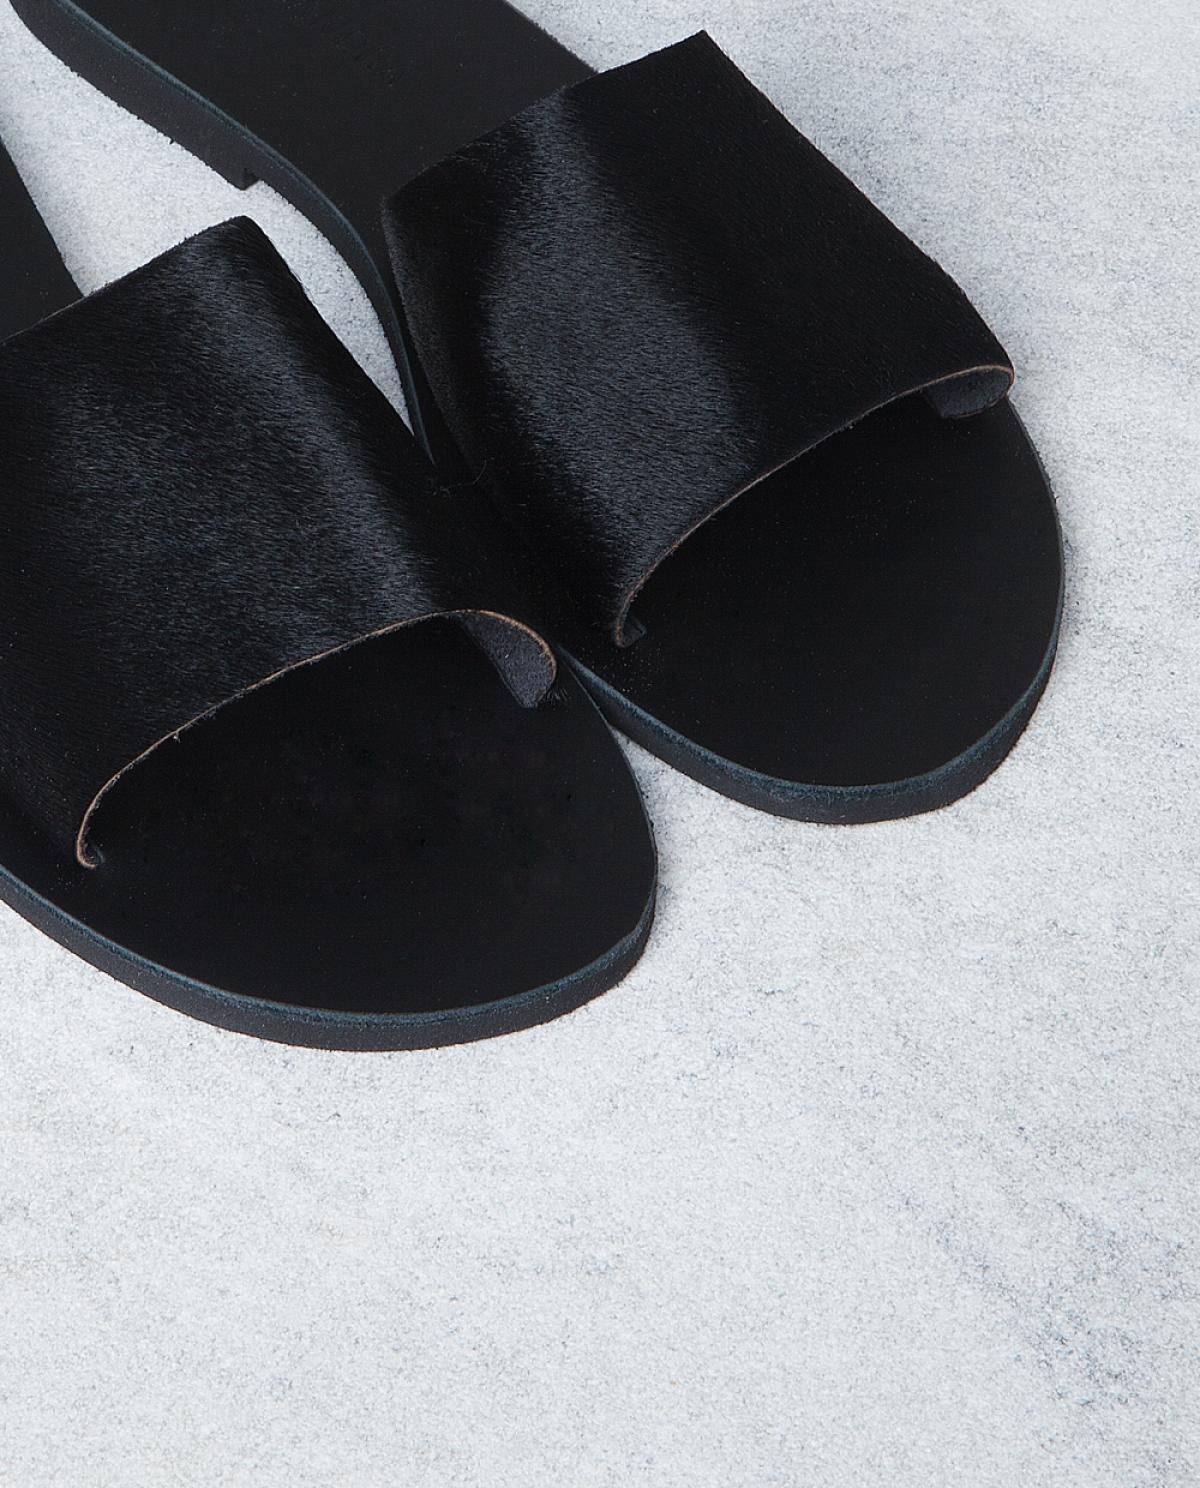 Aspros Kavos Serifos Sandals